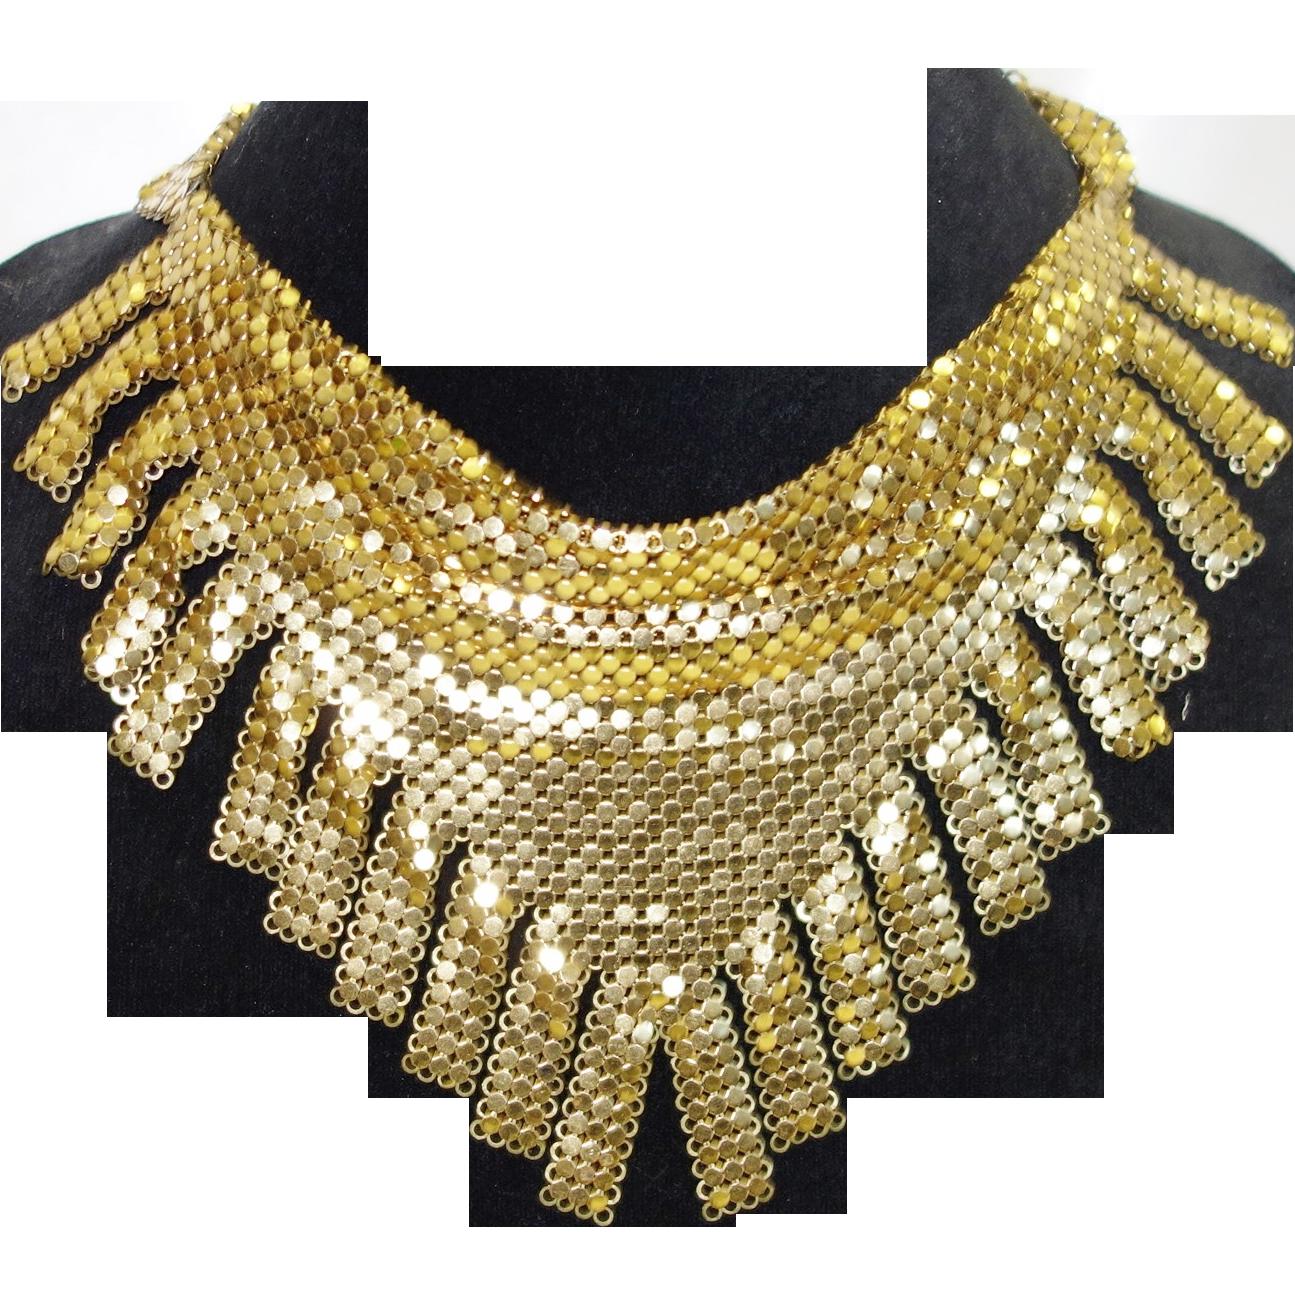 Vintage Whiting and Davis Gold Tone Metal Mesh Fringed Bib Necklace